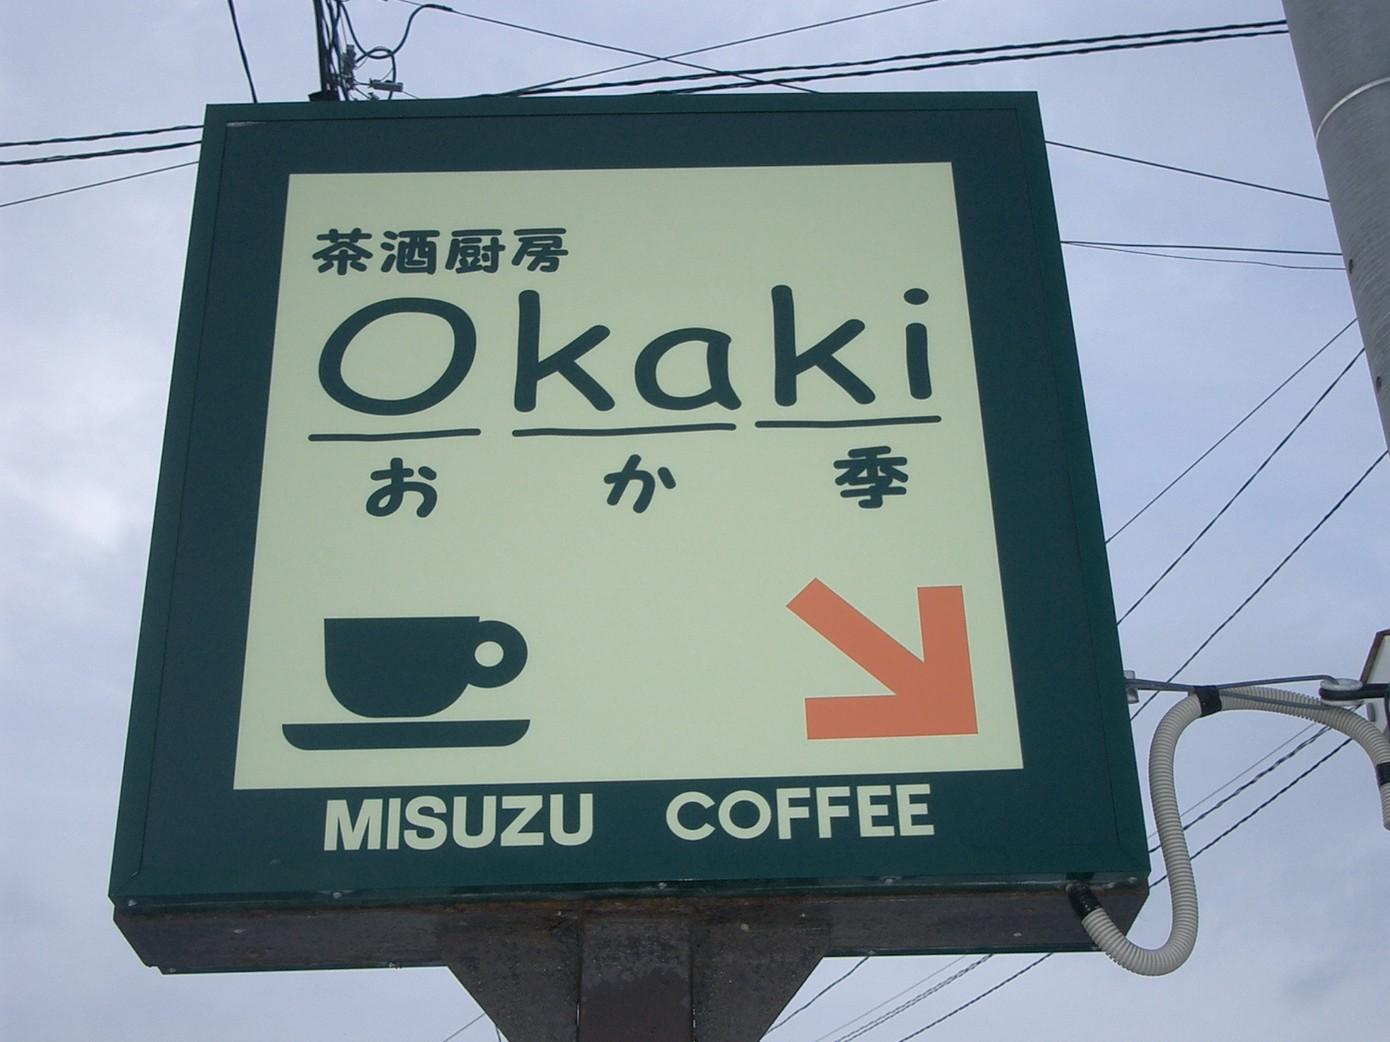 茶酒厨房 Okaki